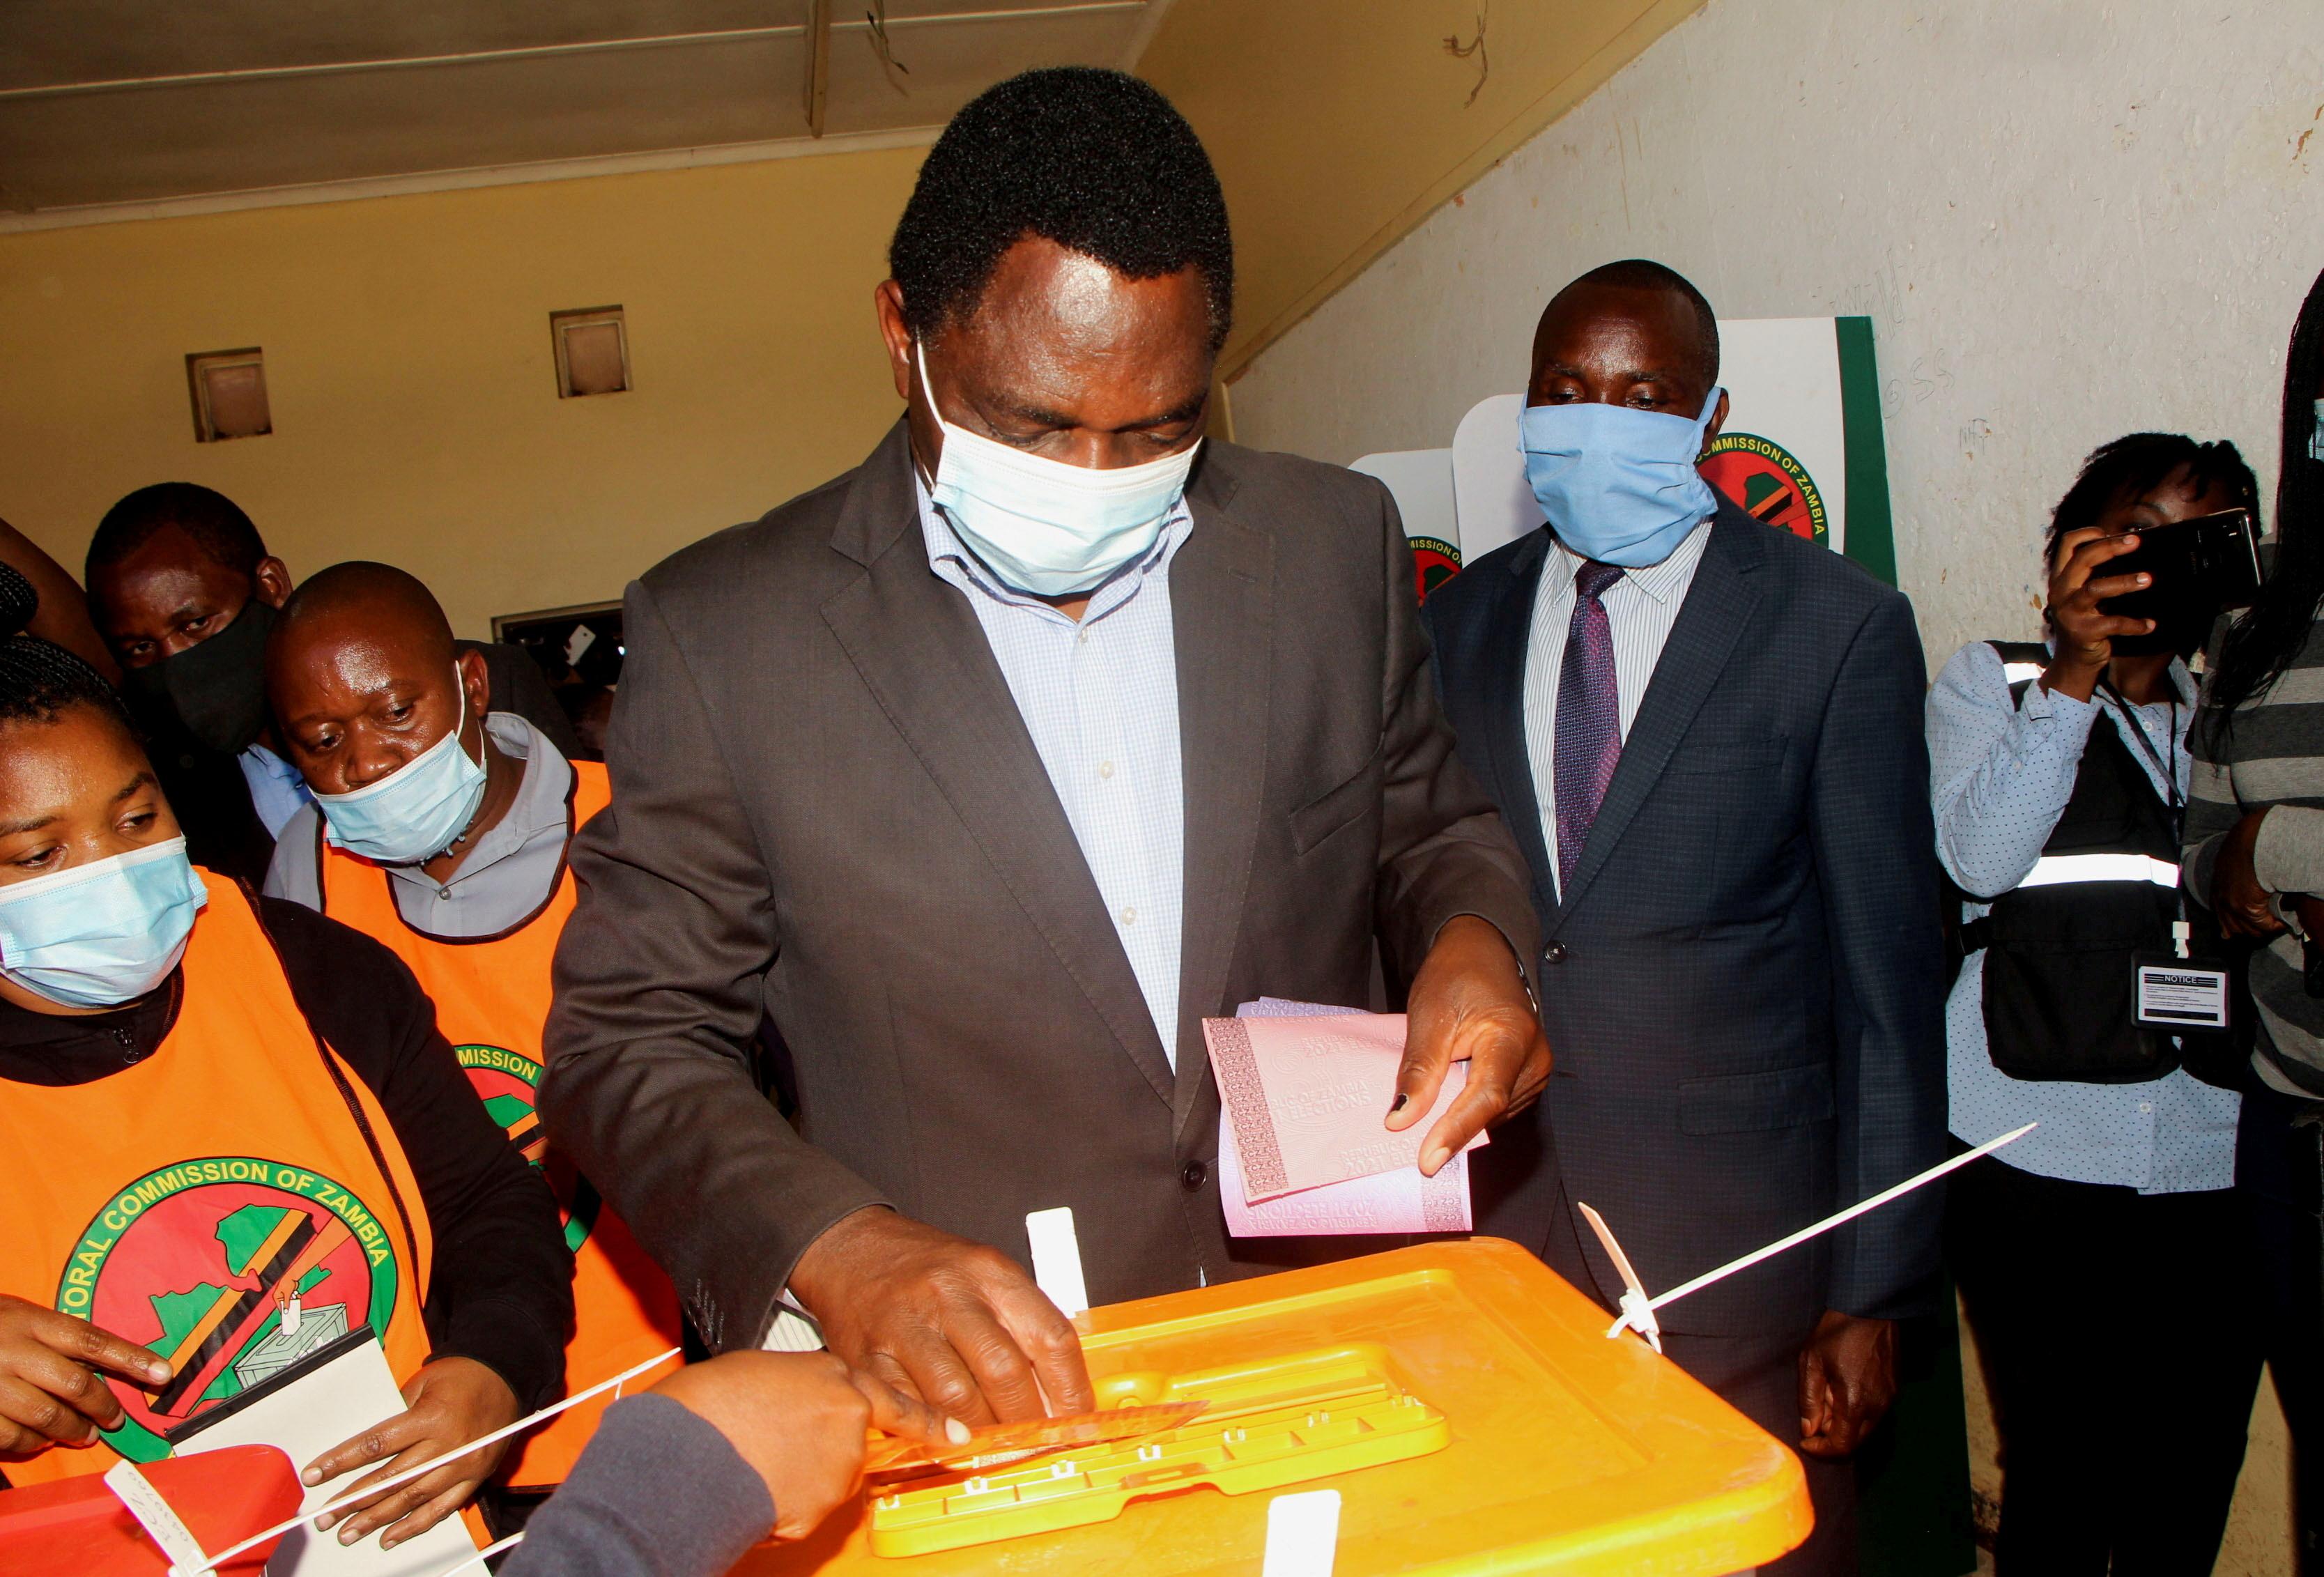 President  Hakainde Hichilema casts his ballot in Lusaka, Zambia, August 12, 2021. REUTERS/Jean Ndaisenga/File Photo